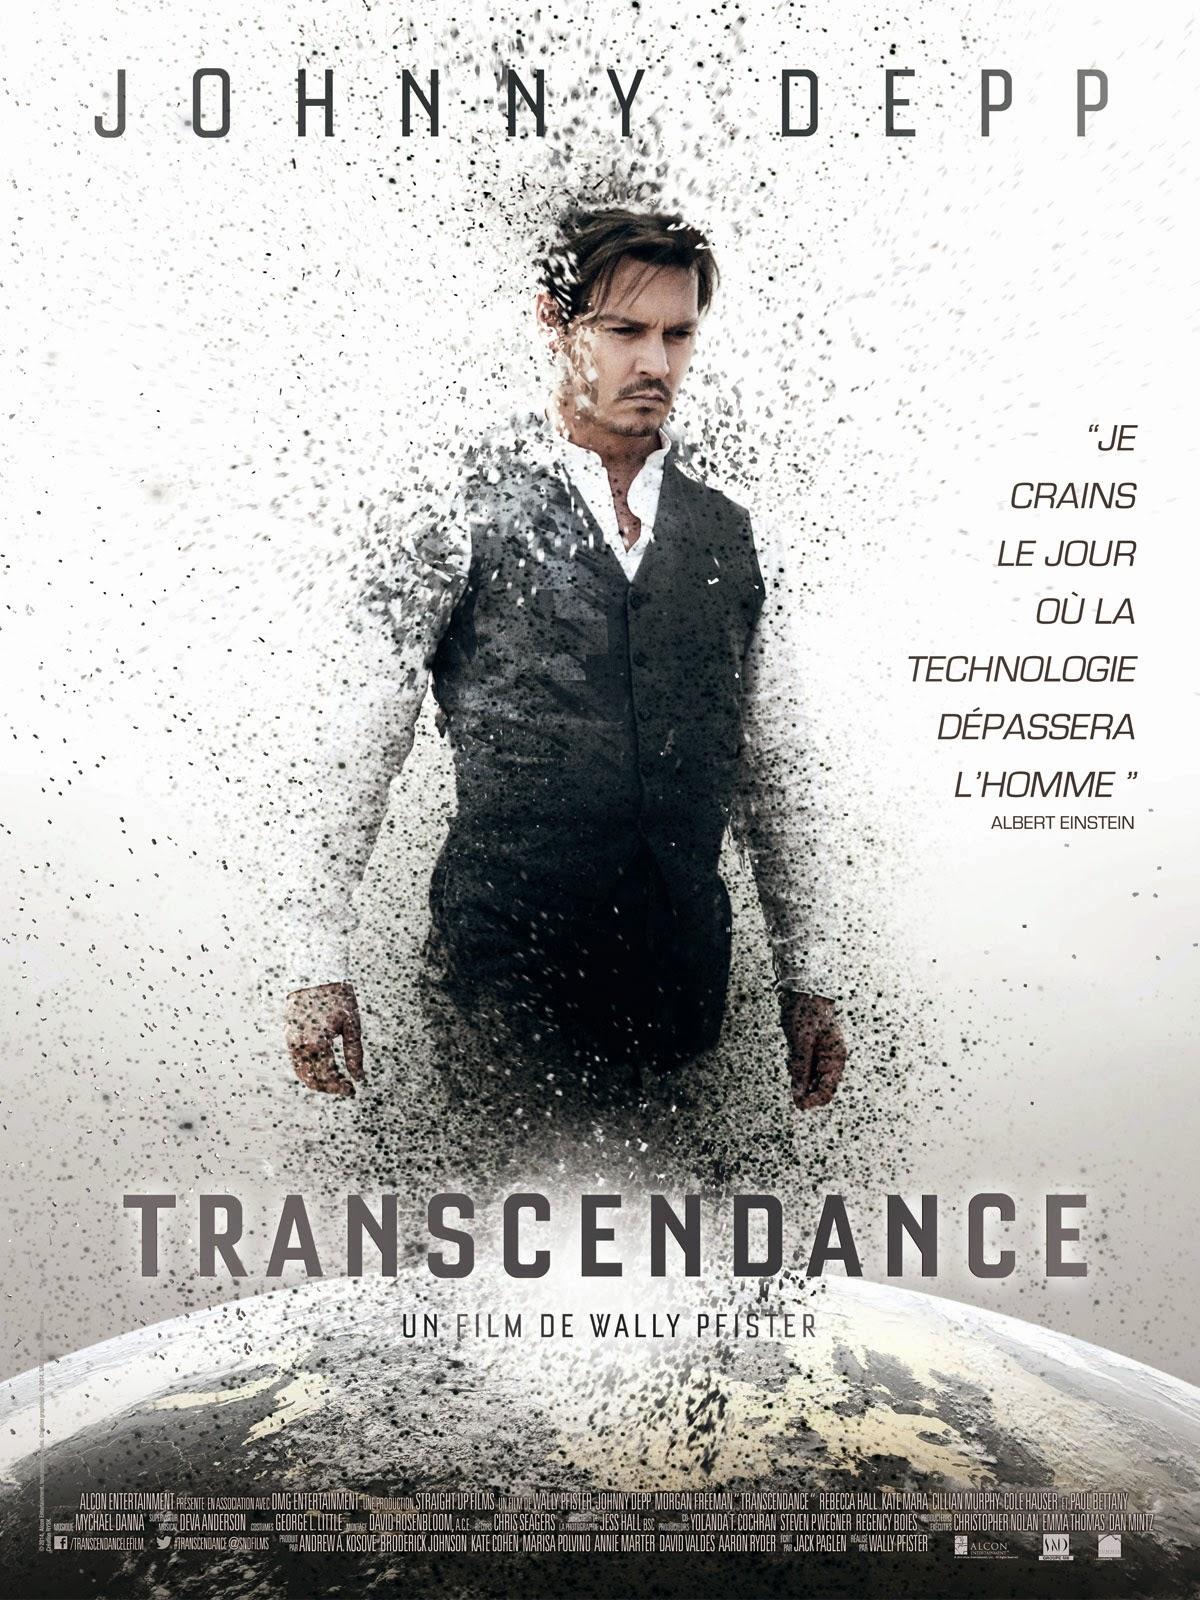 Télécharger transcendance 2014 truefrench